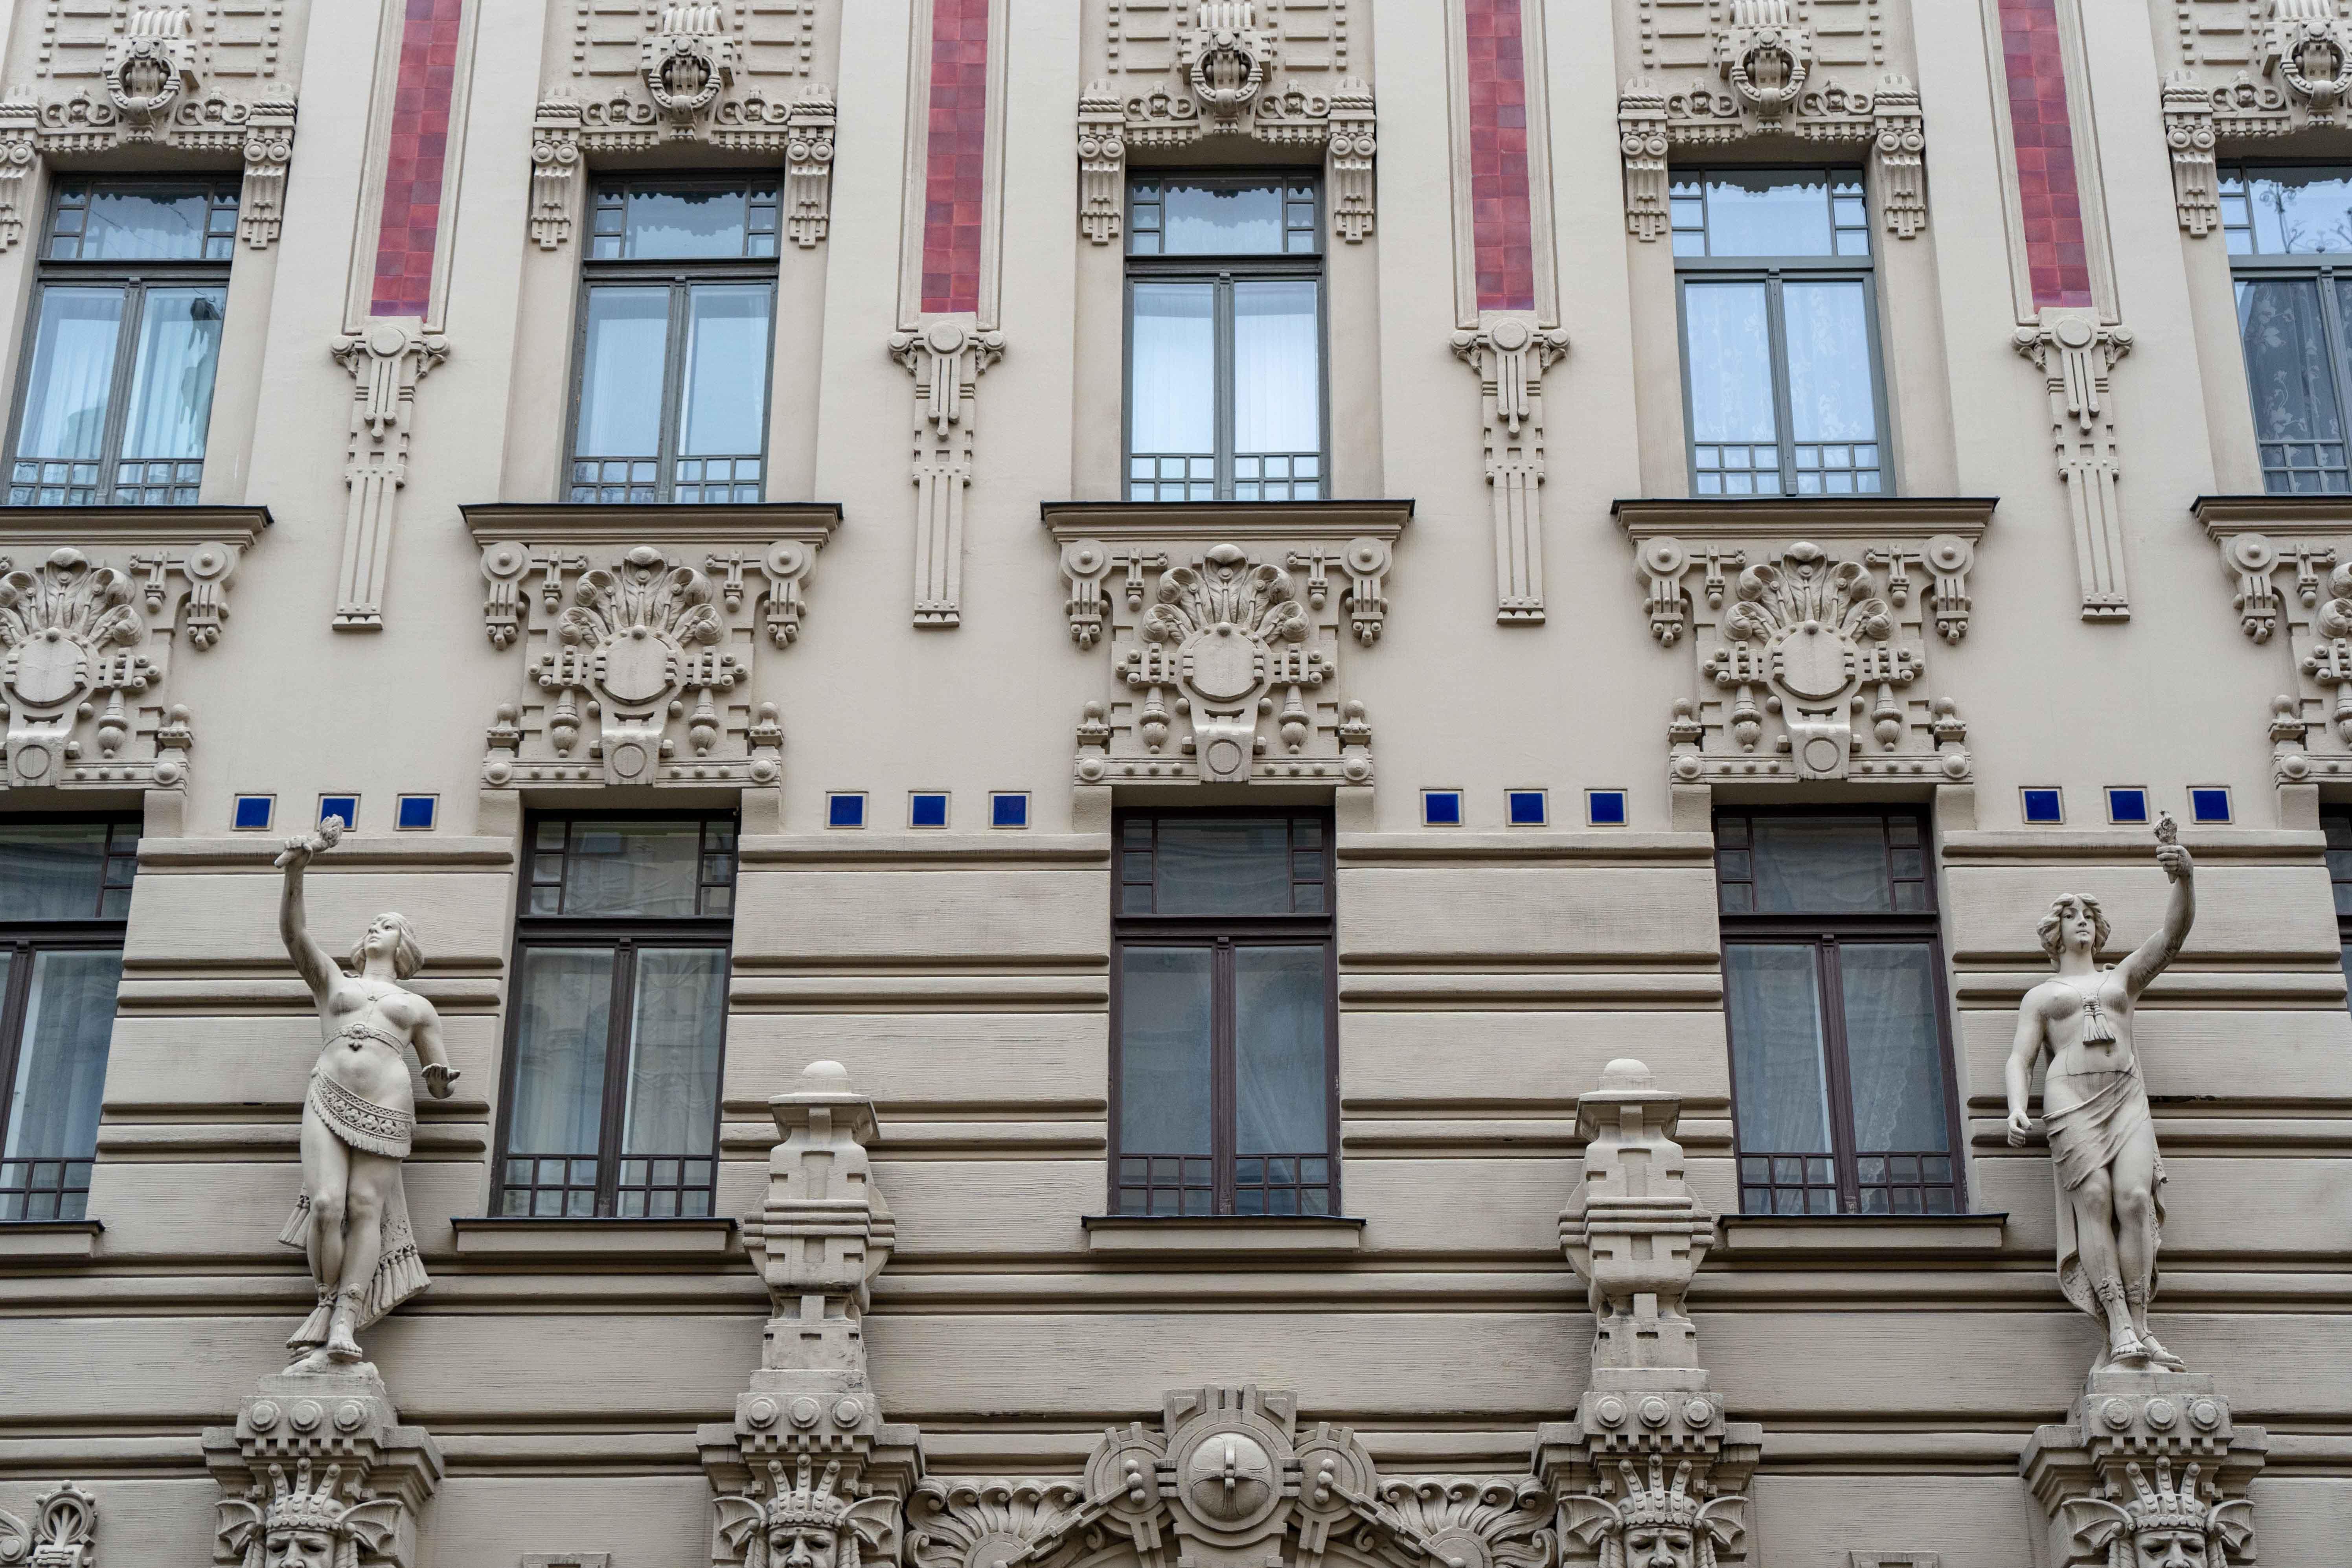 Alberta Iela Architecture Art Nouveau Visiter Riga Odysight Blog Voyage